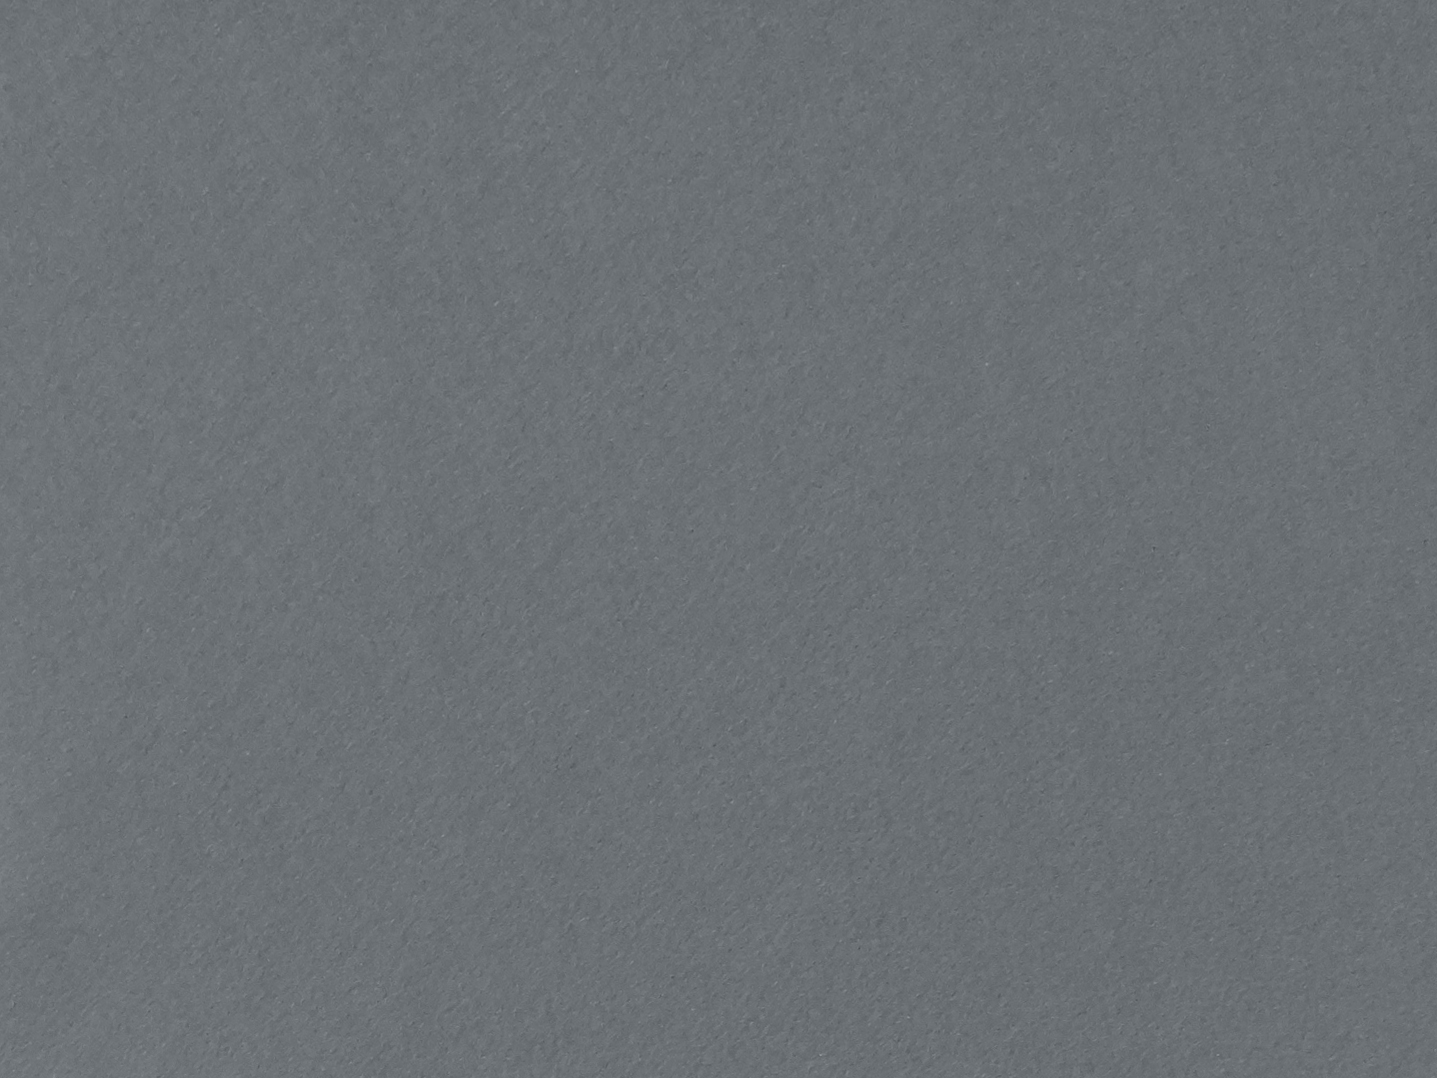 Handicraft Nonwovens A4, gray